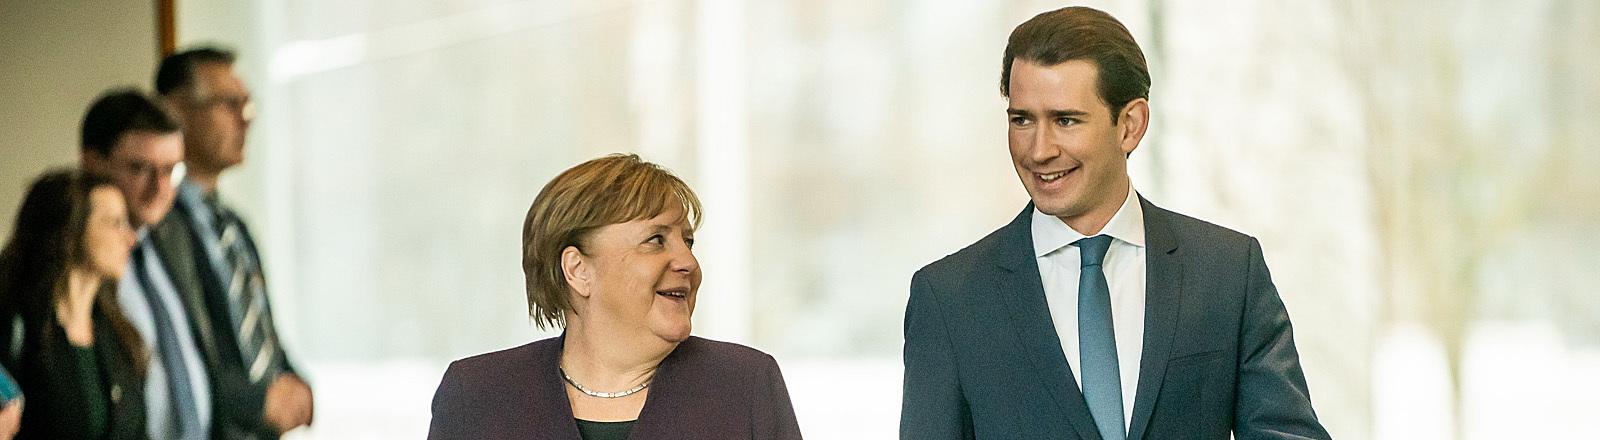 Angela Merkel und Sebastian Kurz in Berlin